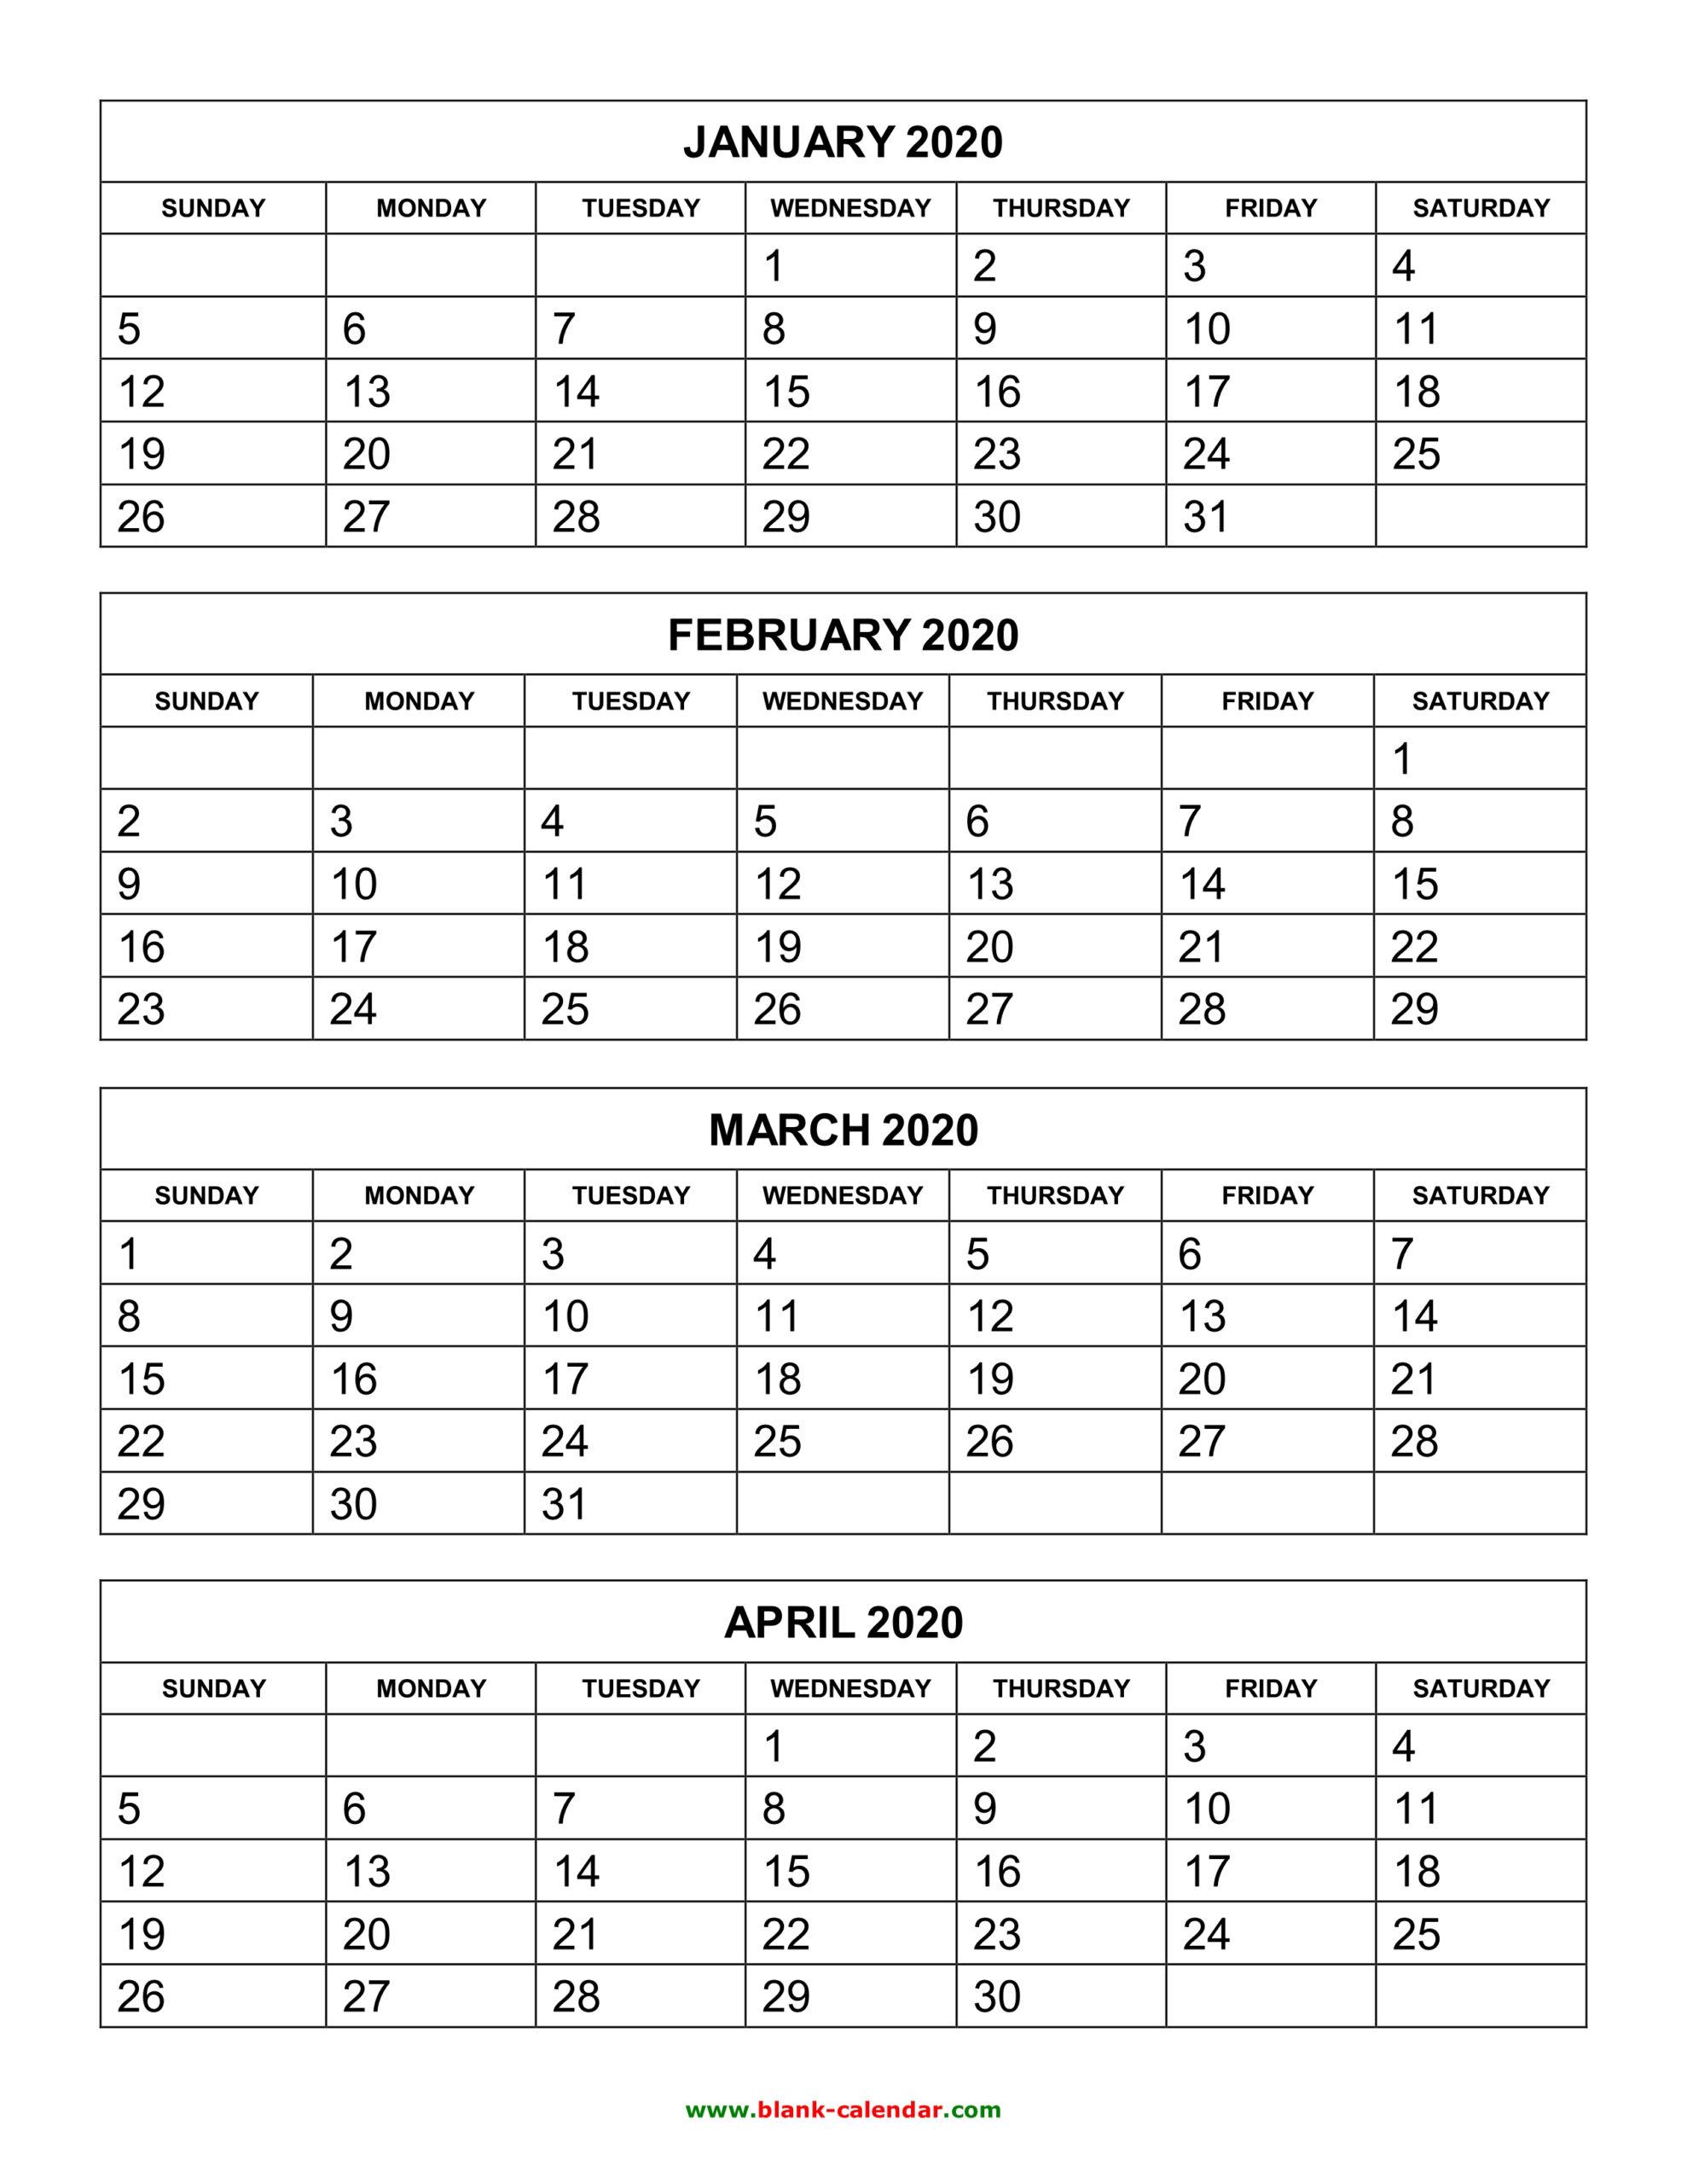 Free Download Printable Calendar 2020, 4 Months Per Page, 3 pertaining to Free Printable 4 Month Calendar